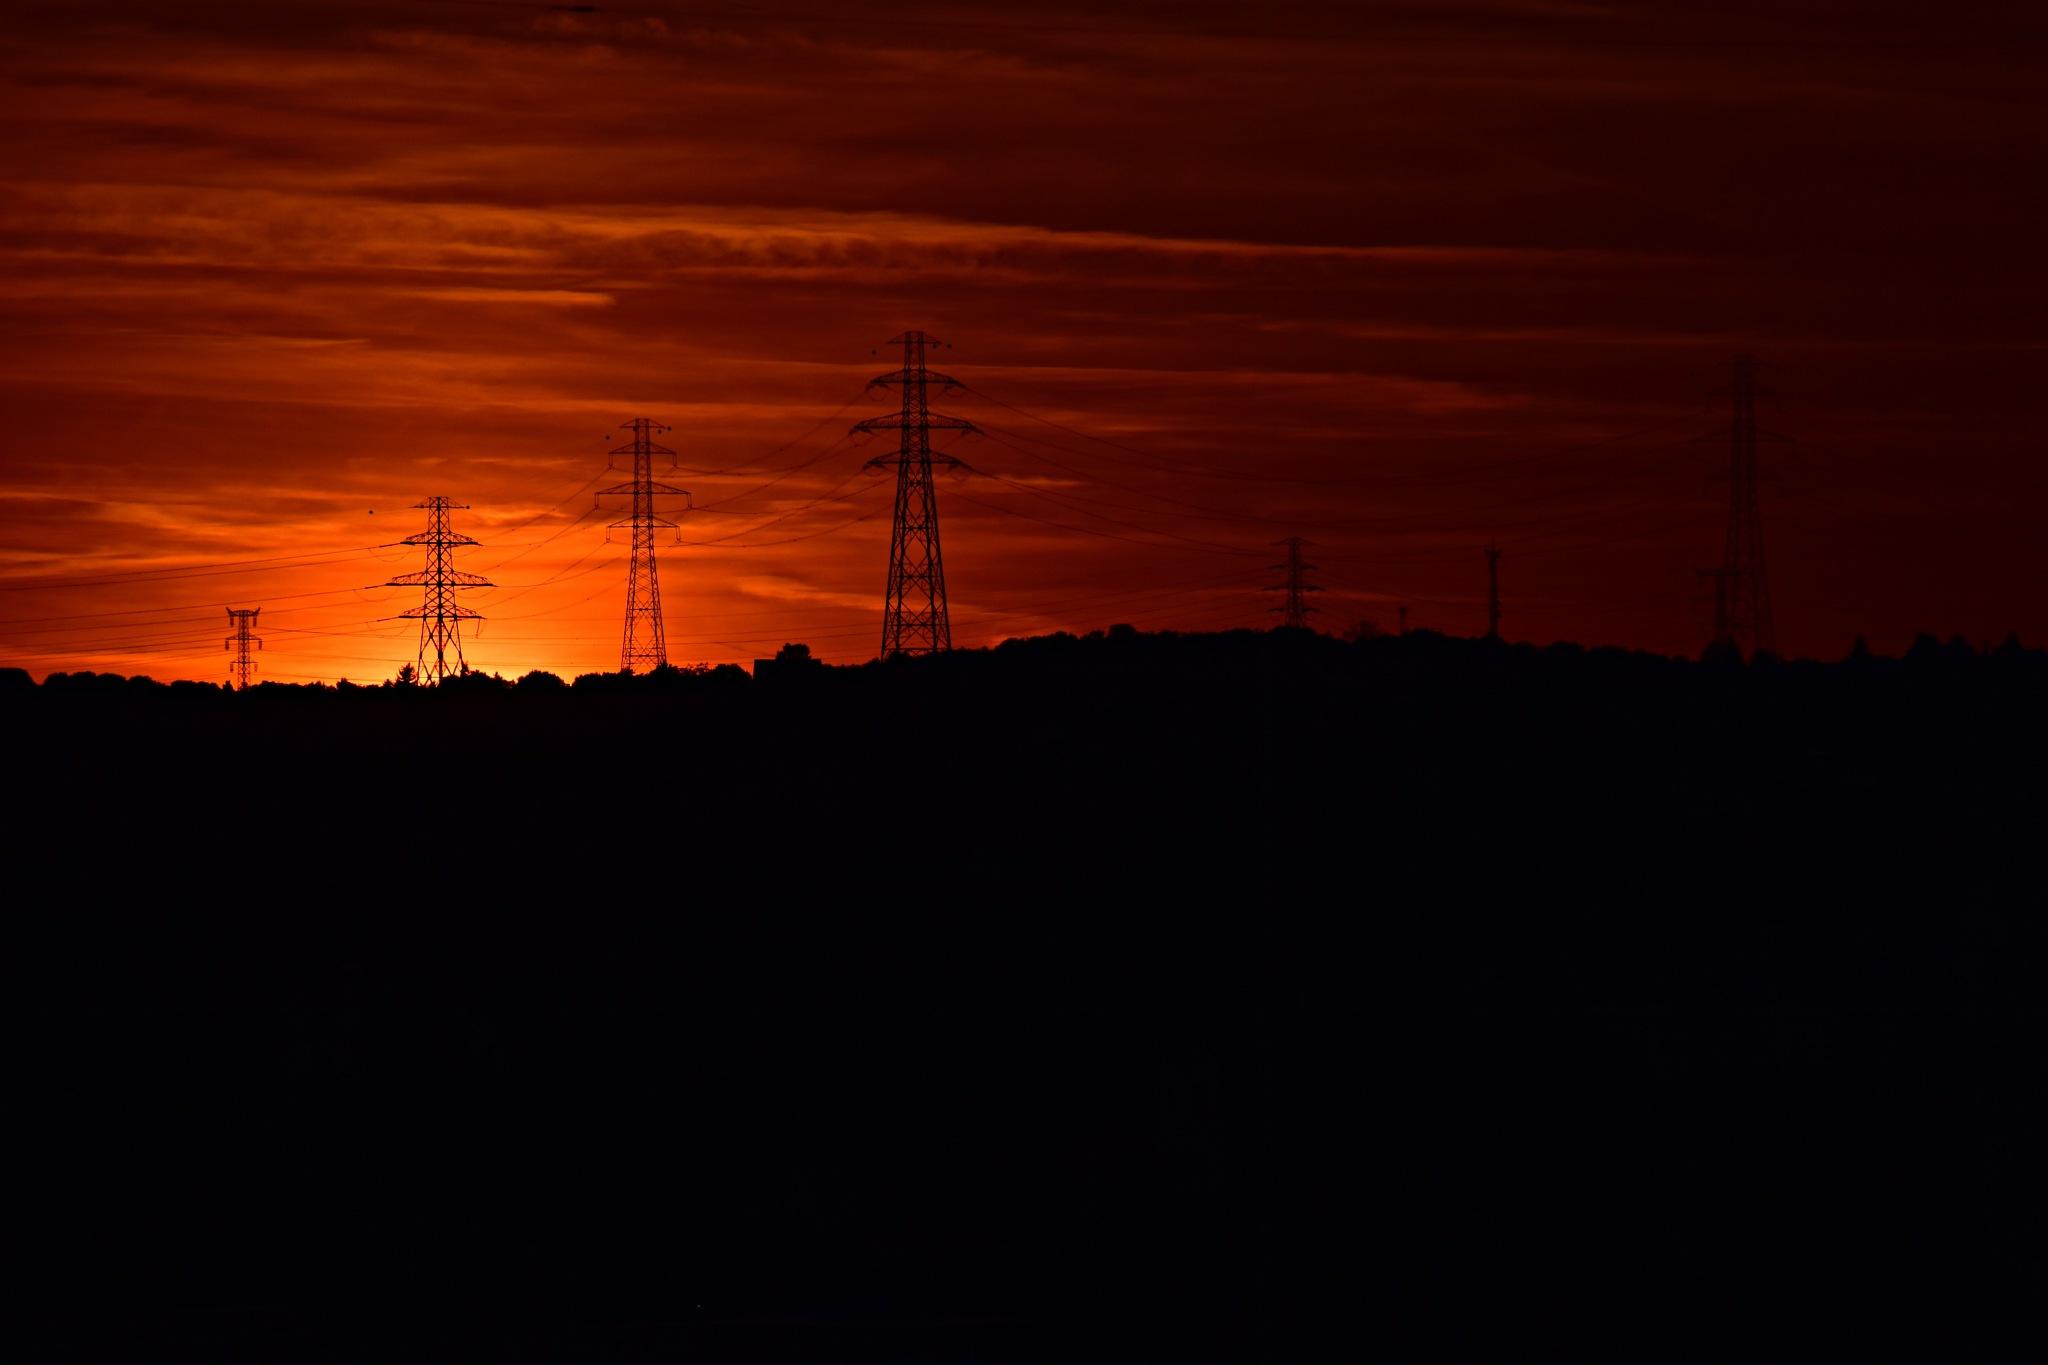 Sunset by Rita Cseh